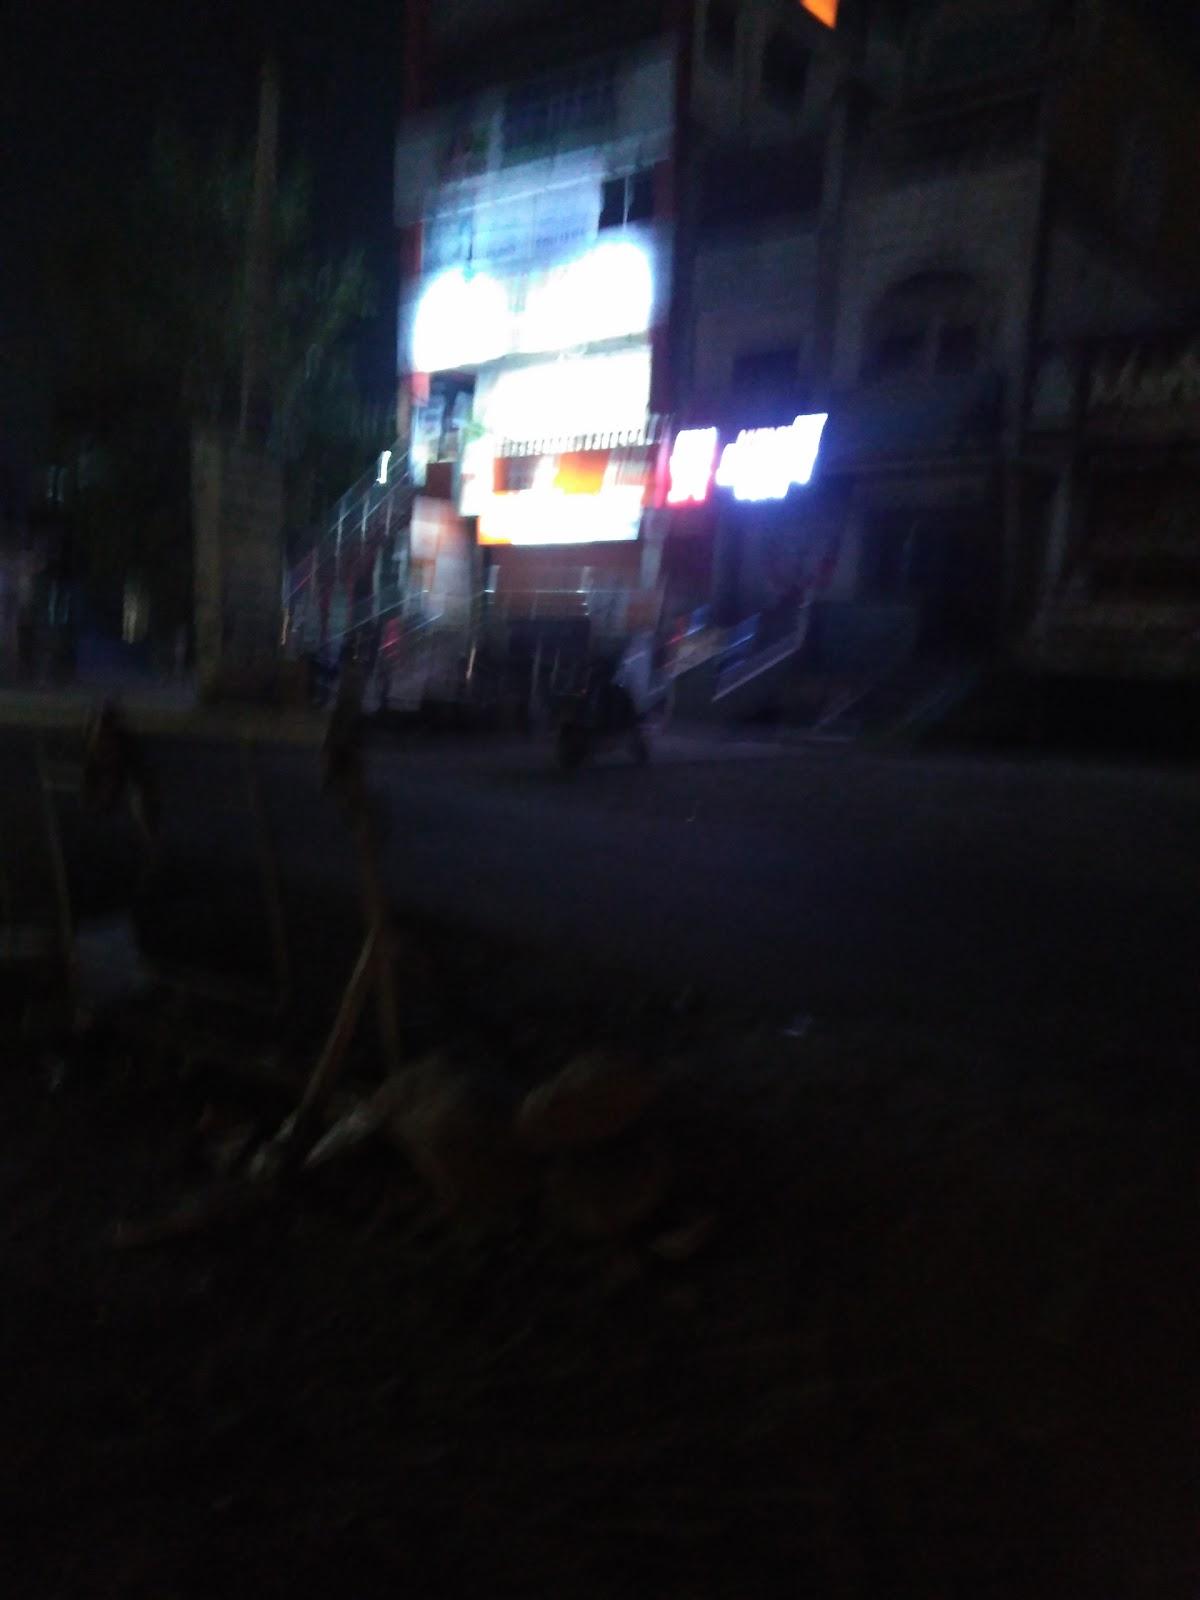 blood bank Bank Of Baroda near Hyderabad Telangana